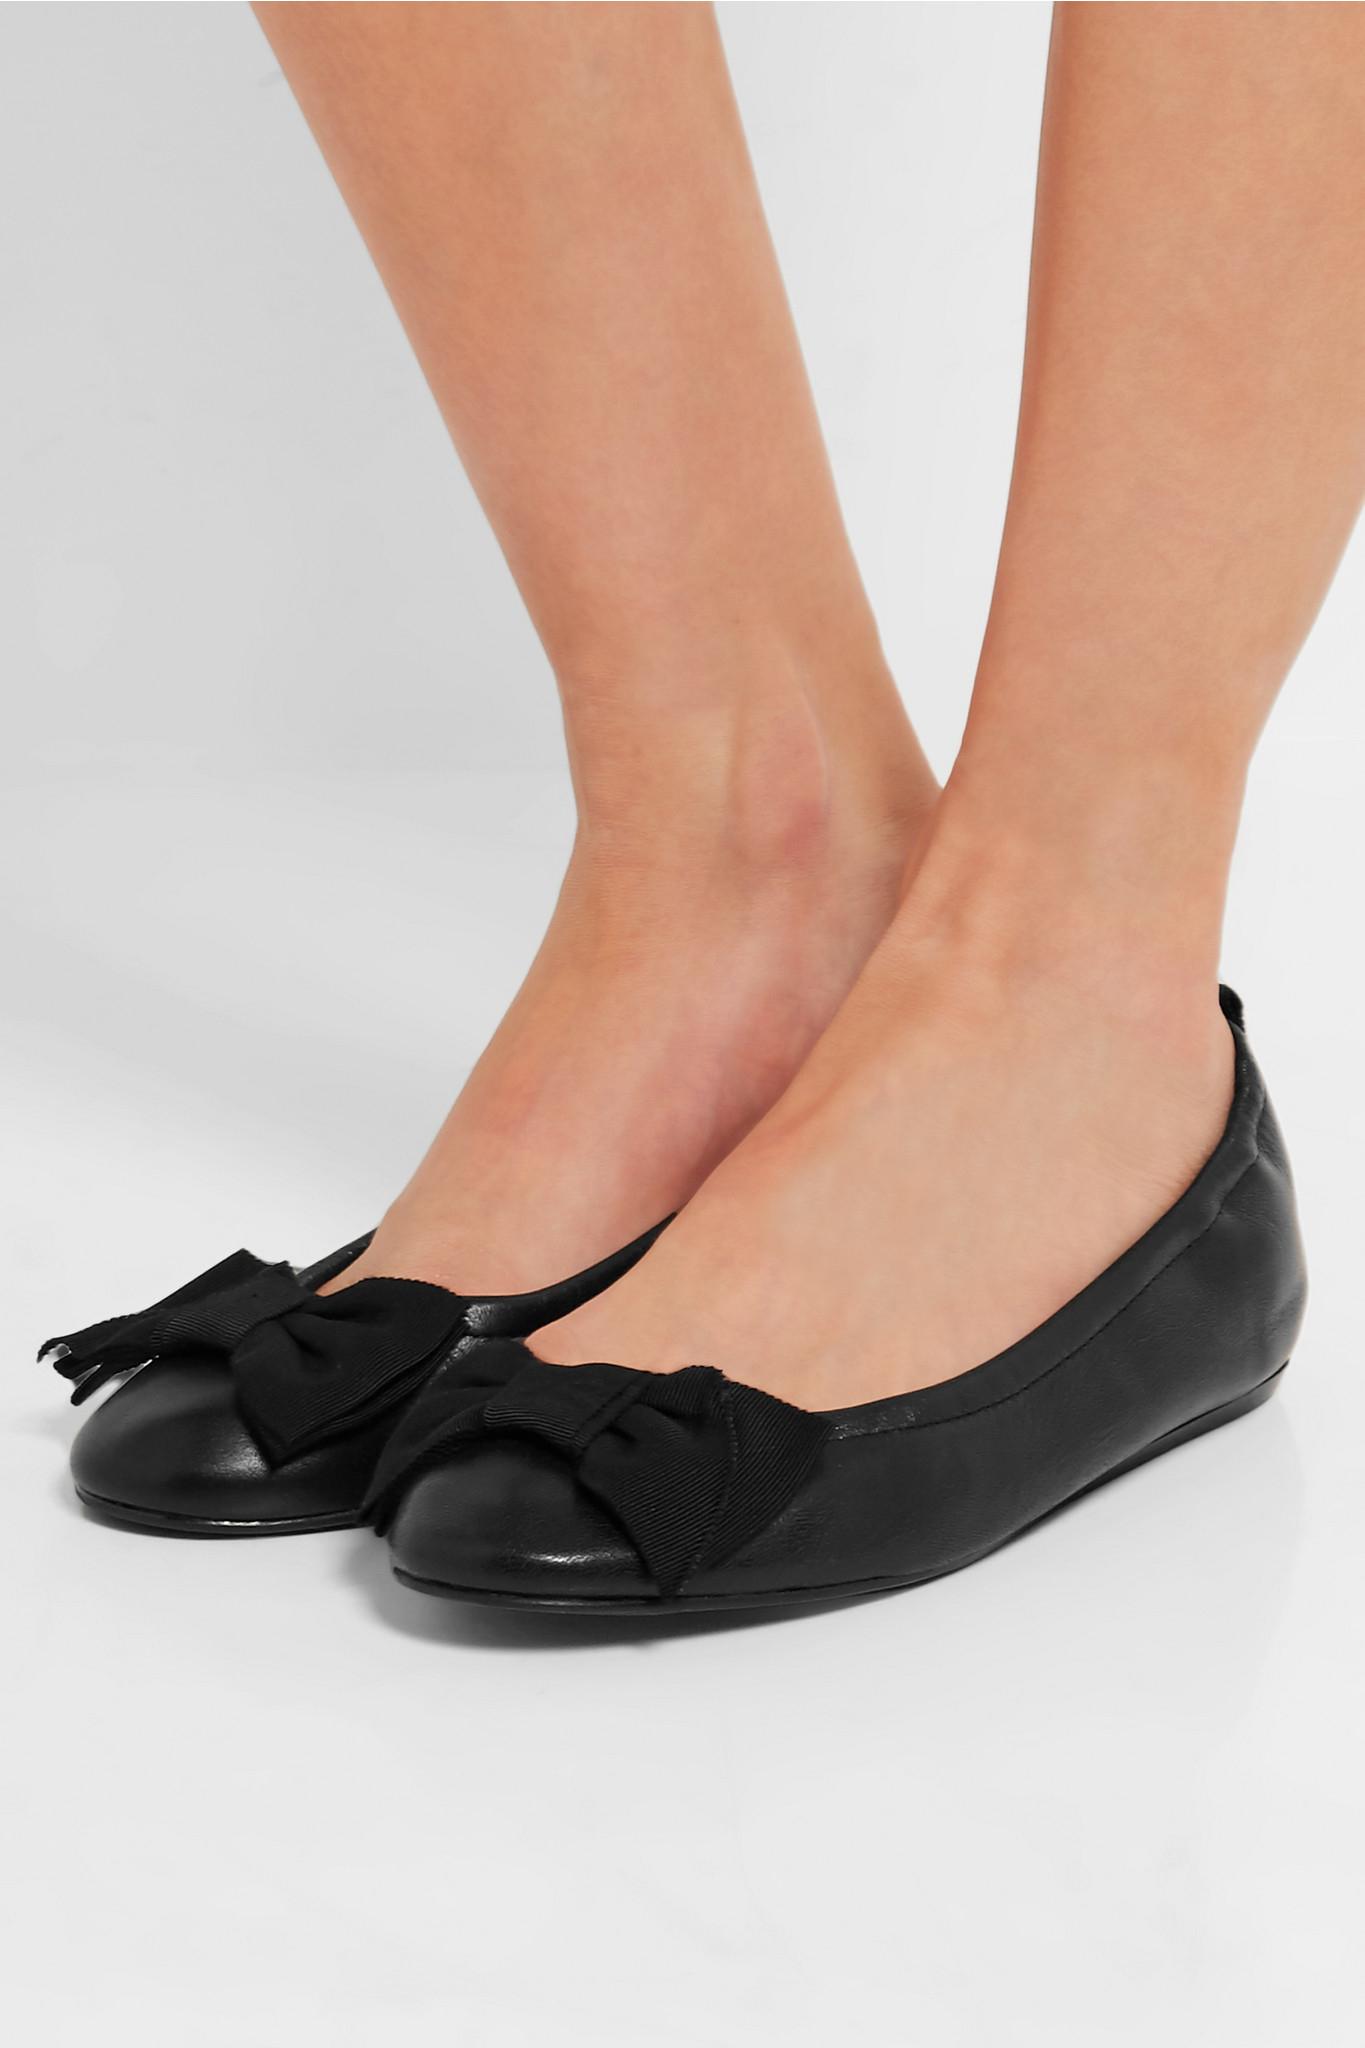 c57522f7cc6c Lyst - Lanvin Leather Ballet Flats in Black